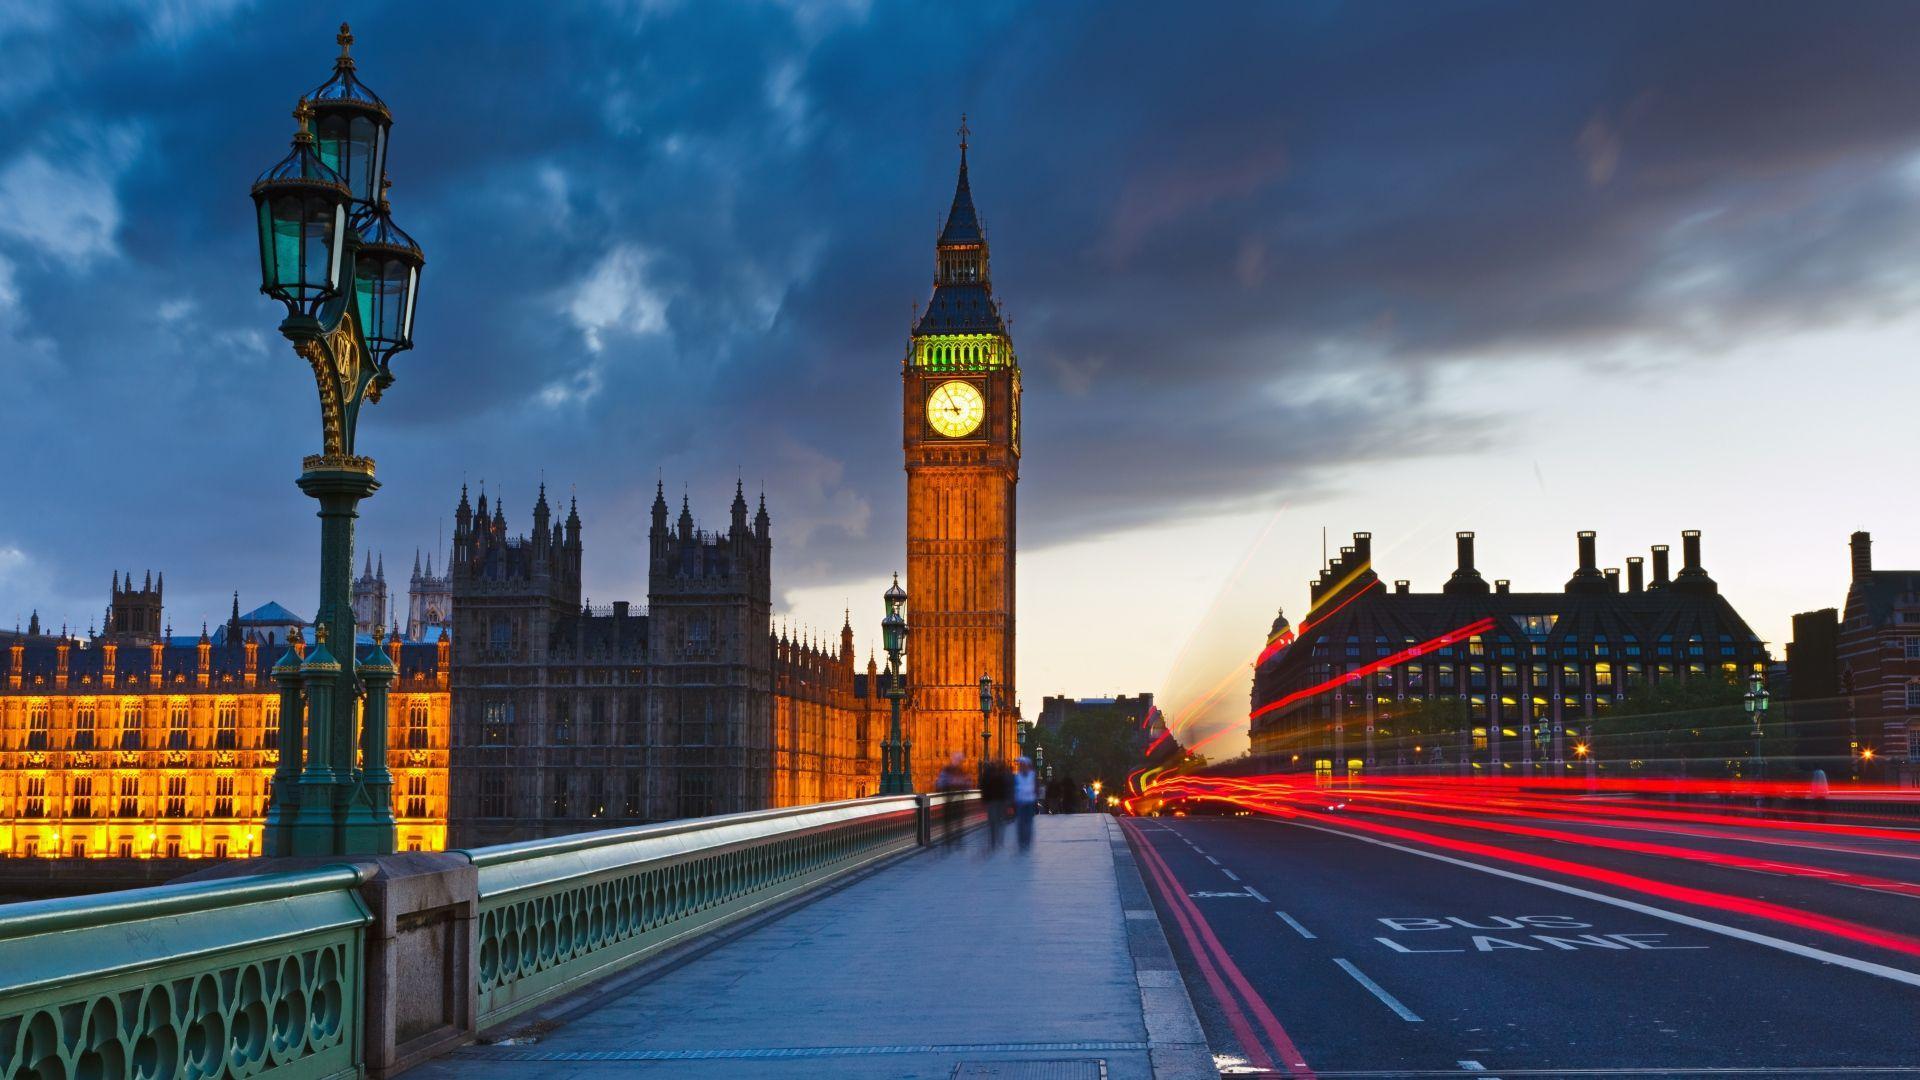 London Wallpapers Hd 1080p Wallpaper Cave